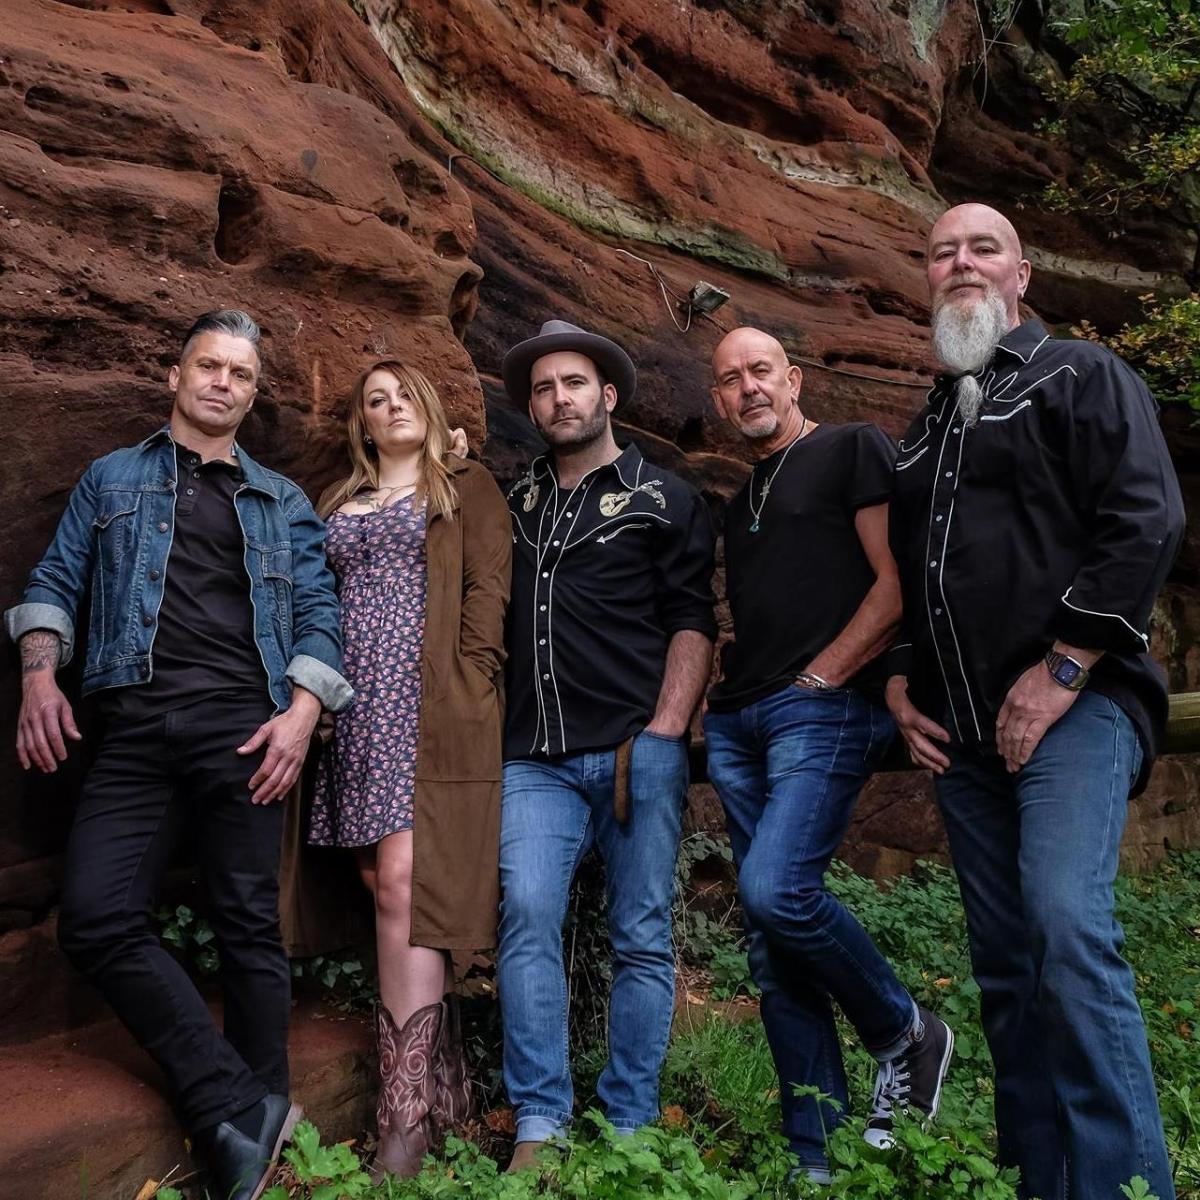 Stone Mountain Sinners featuring Sarah Warren